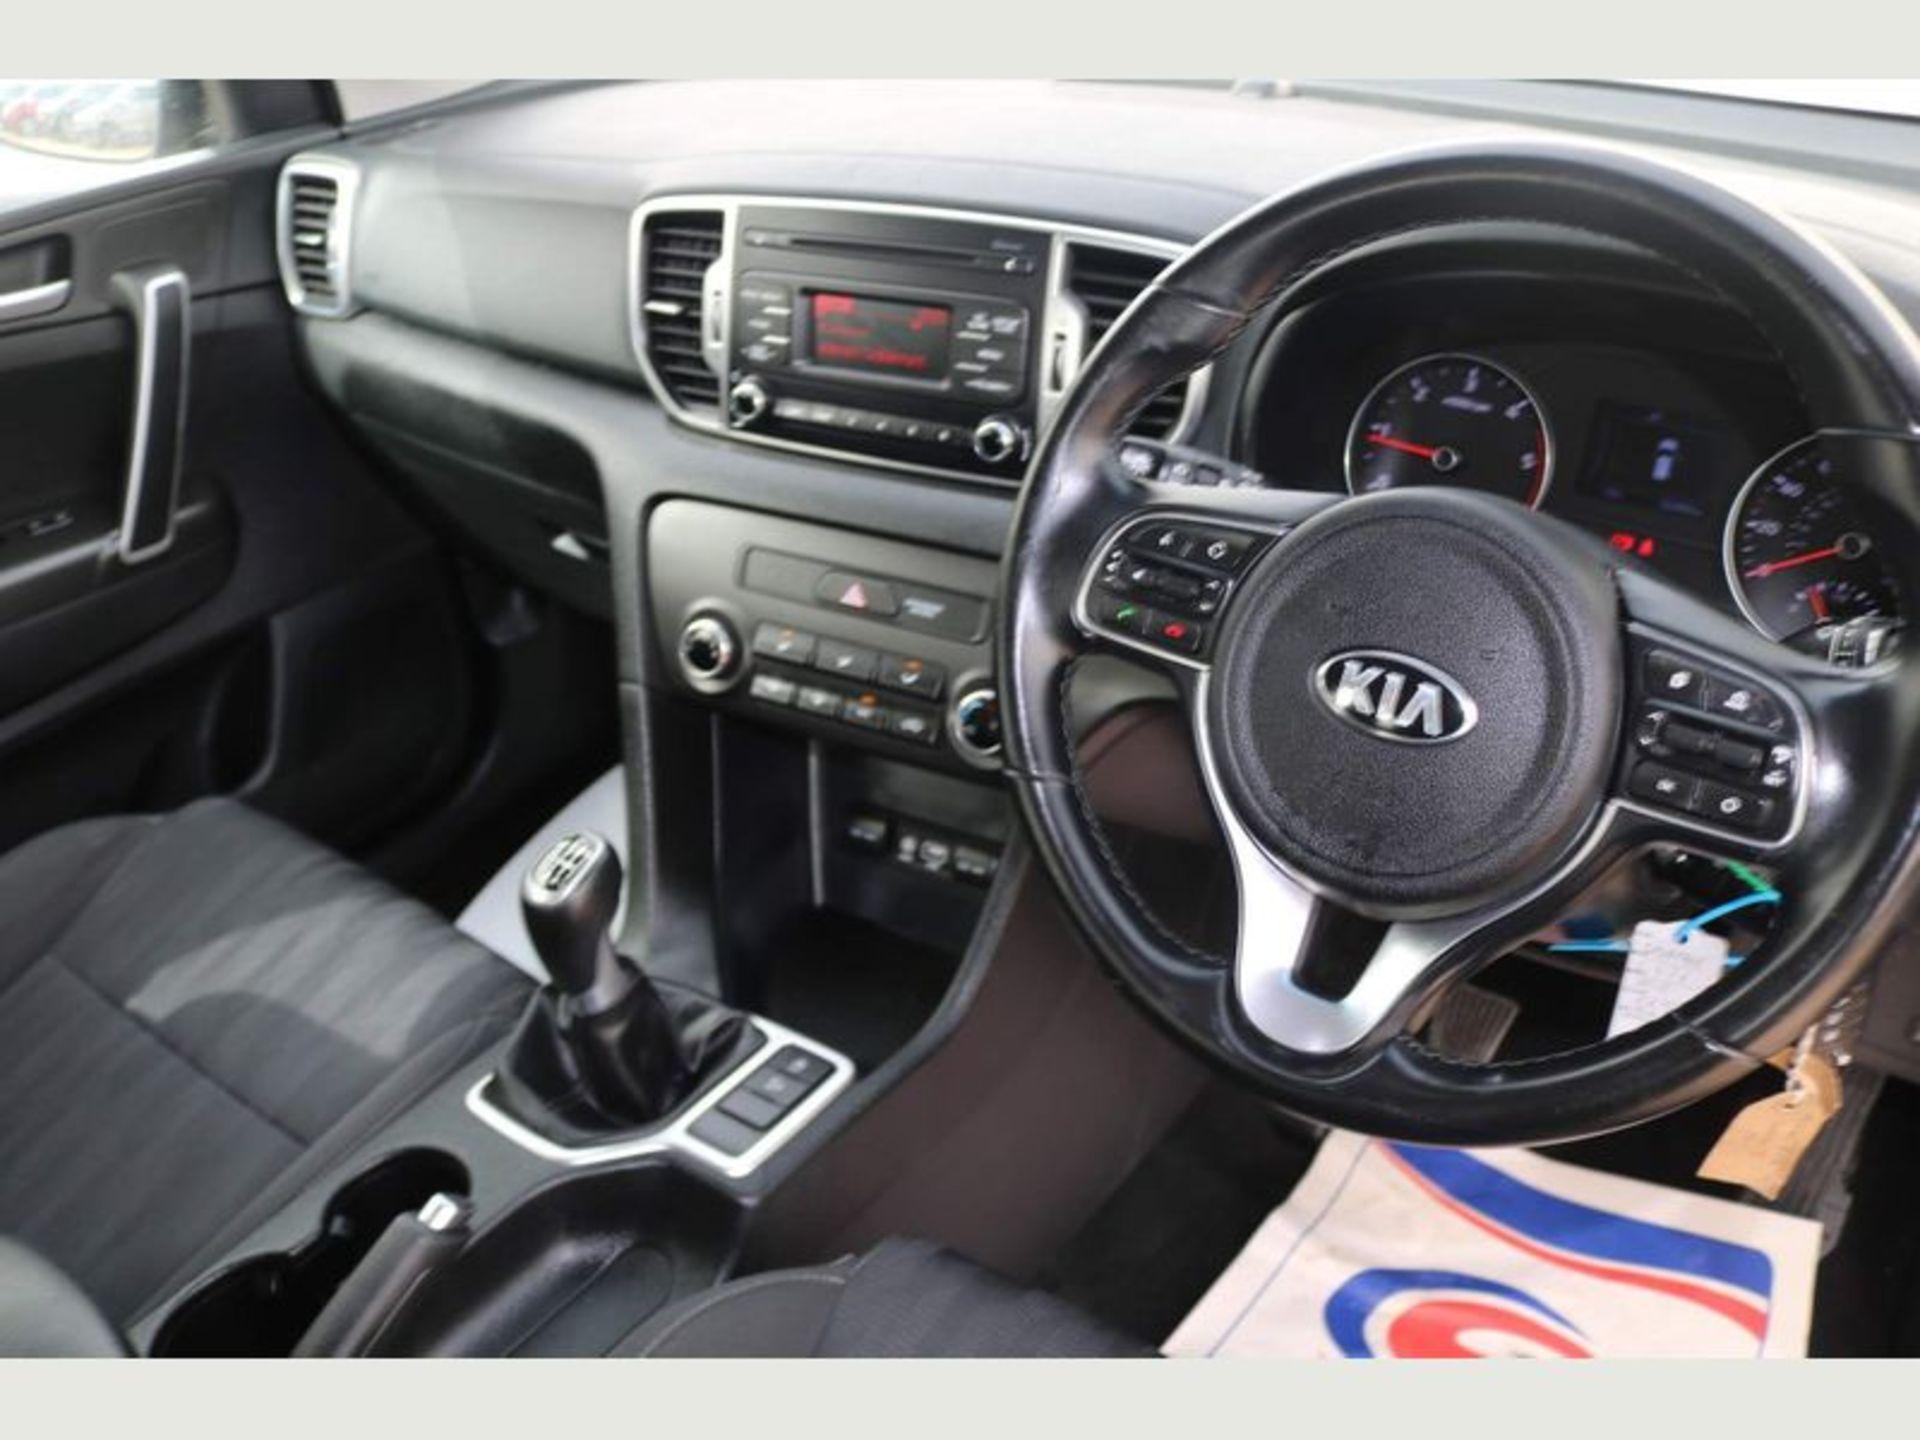 (Reserve Met)KIA Sportage 1 1.7 CDRI LSG (SUV) - 2017 17 Reg - Cruise Control -Bluetooth - FSH - - Image 5 of 6